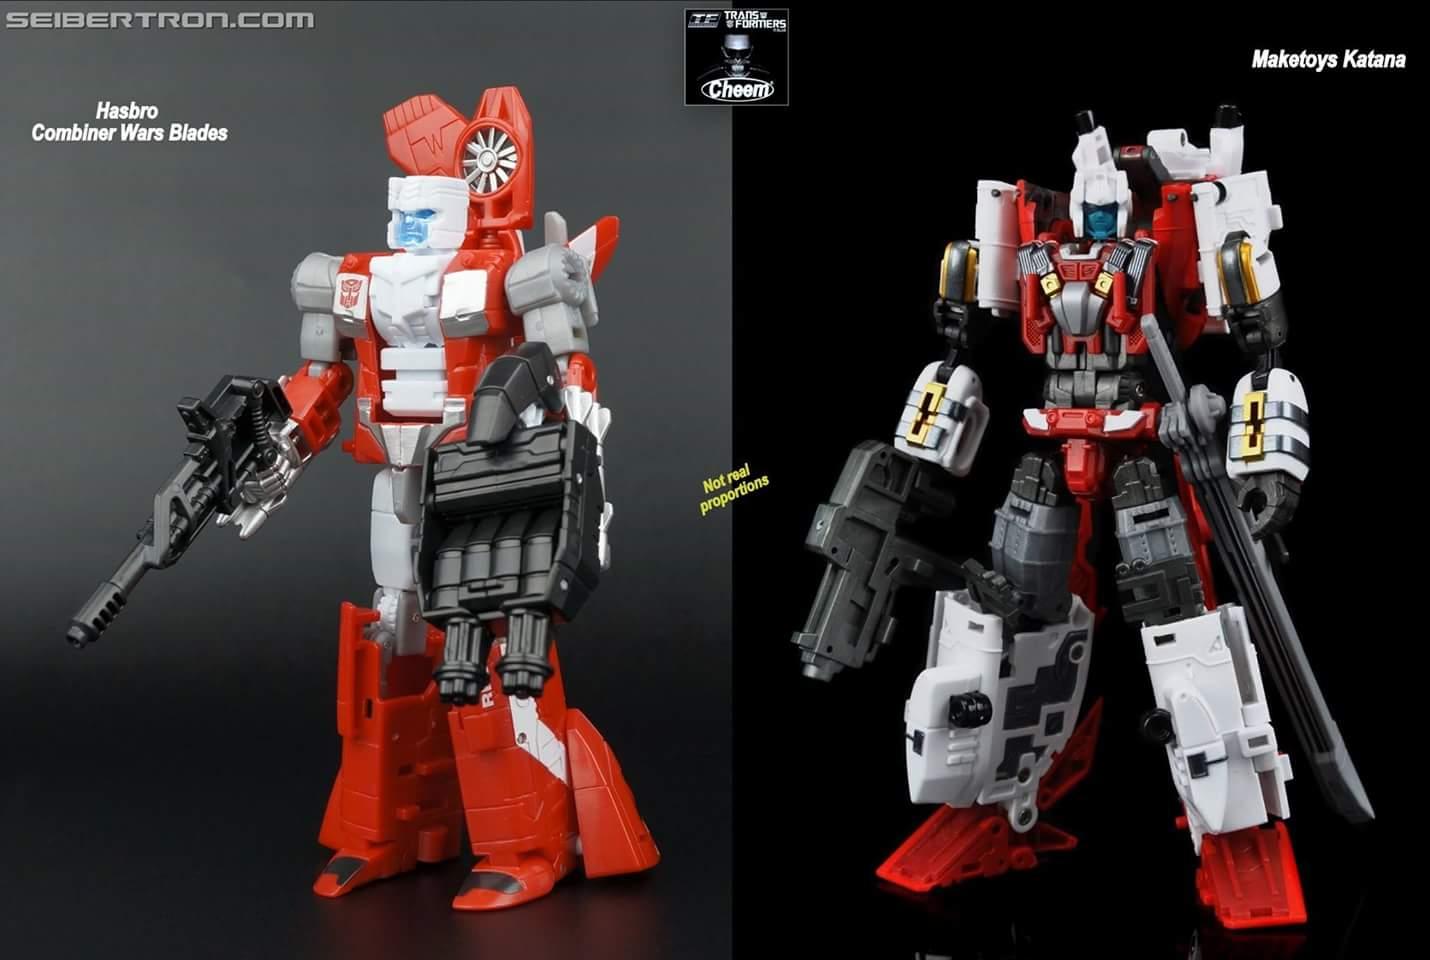 [MakeToys] Produit Tiers - Jouet MTCM-04 Guardia (aka Protectobots - Defensor/Defenso) - Page 3 JSXs62qb